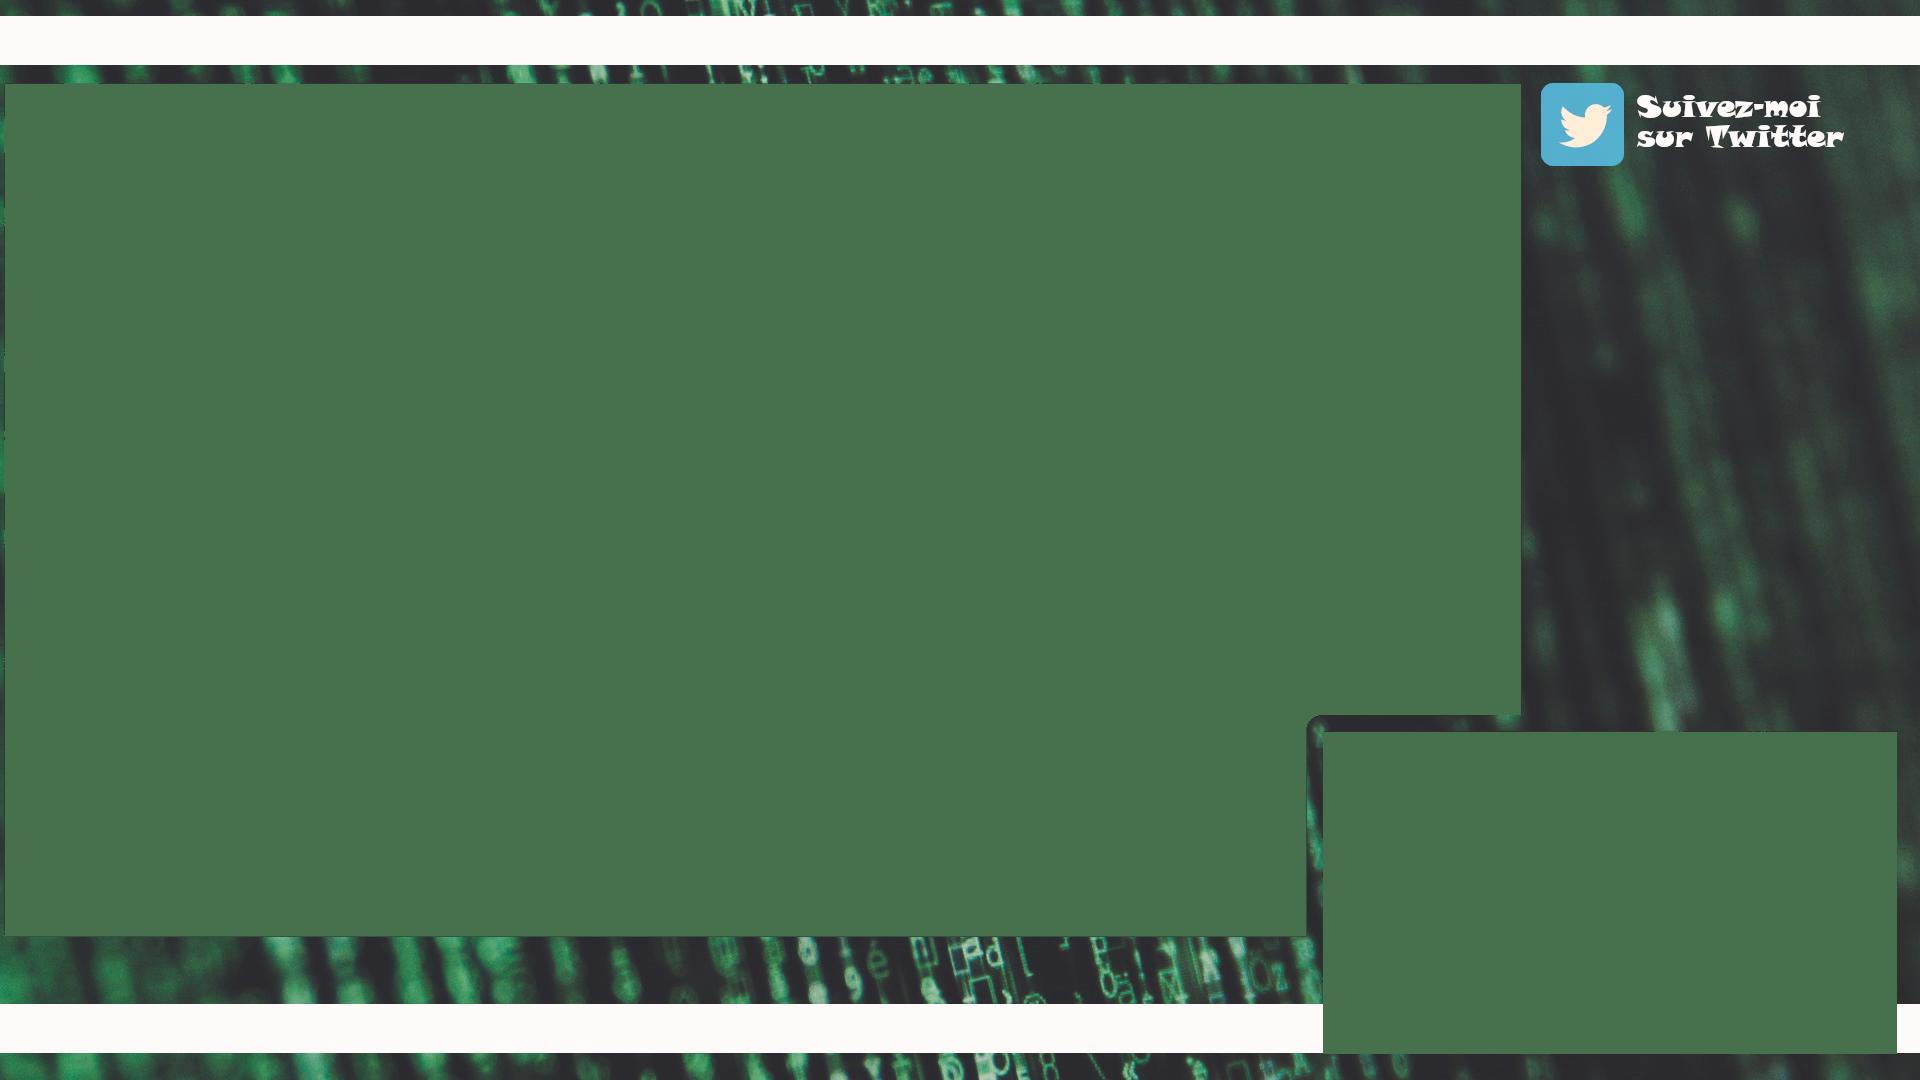 Un overlay pour twitch avec motif matrice en vert avec un logo Twitter